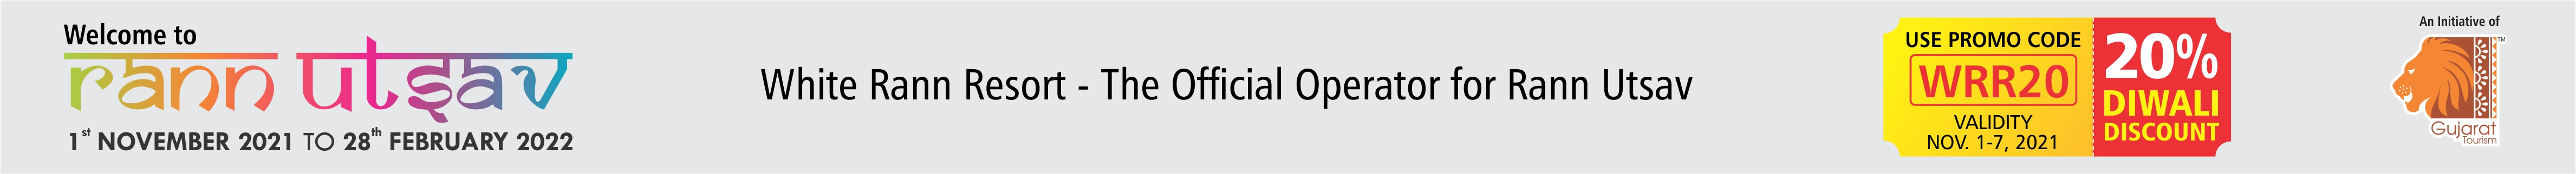 Rann Utsav, Kutch Rann Utsav 2021-2022 | Official Operator of Rann Utsav